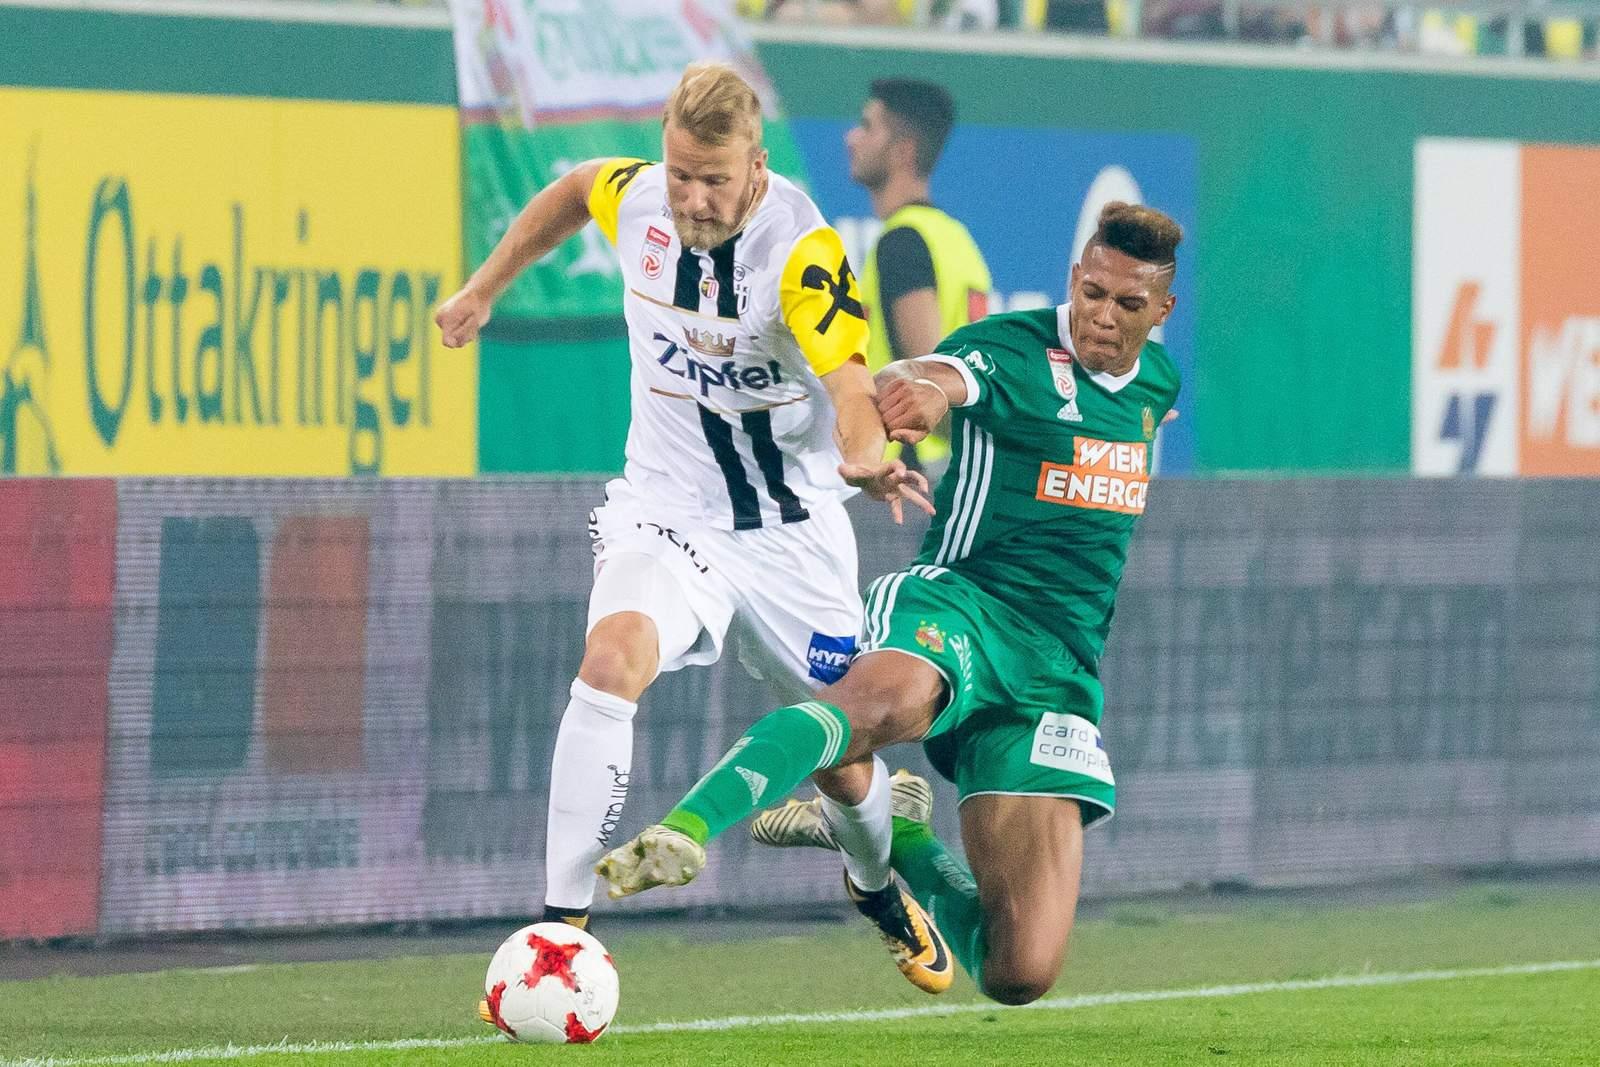 Alexander Linz gegen den heutigen Hoffenheimer Joelinton im Zweikampf.